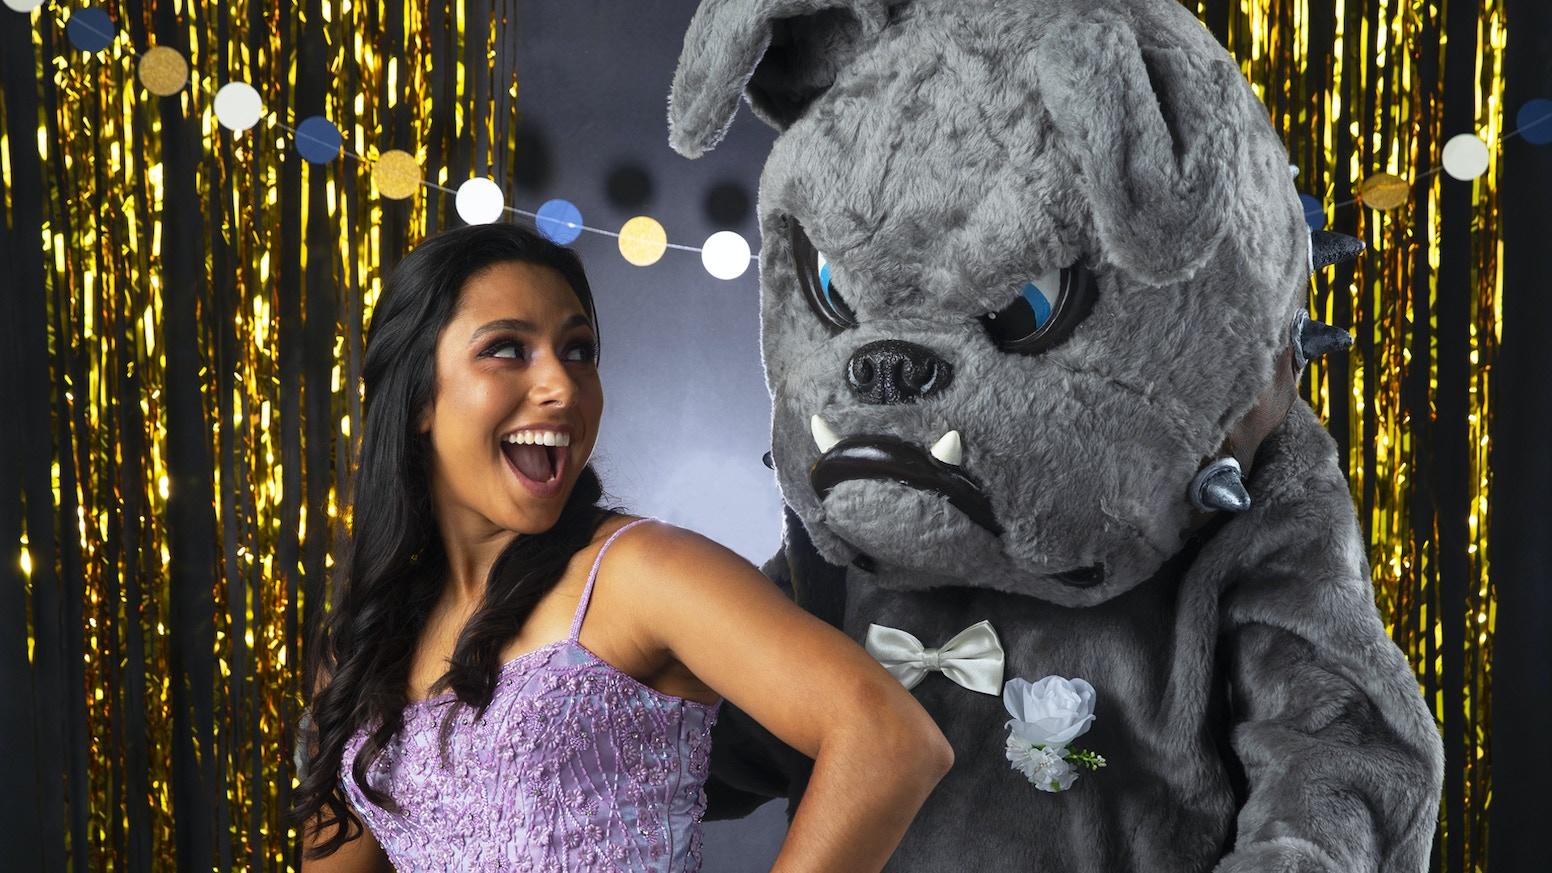 Everyone Loves Bulldog Short Film By Michelle Khare Kickstarter